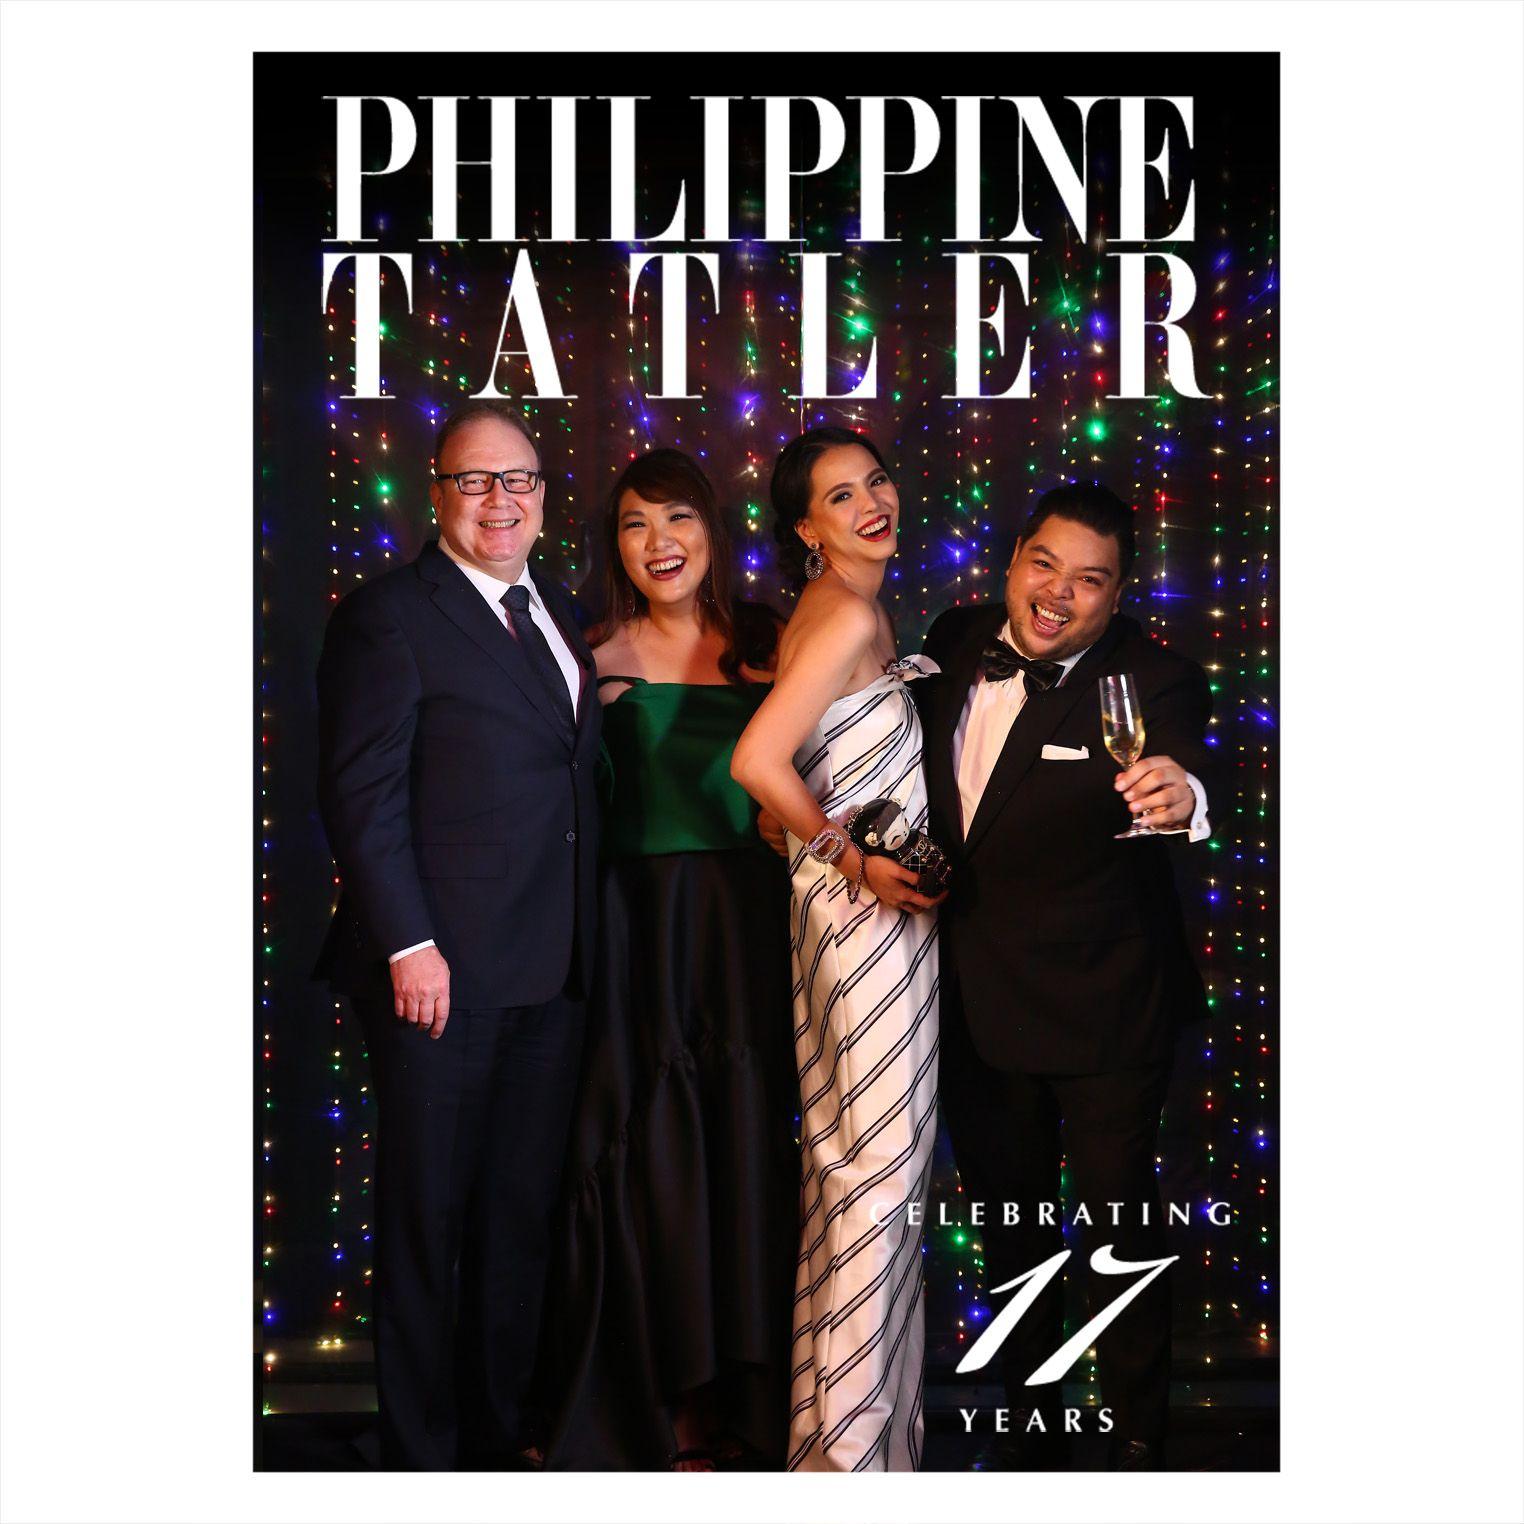 John Rice, Lesley Anne Tan, Ingrid Chua, and Ram Bucoy